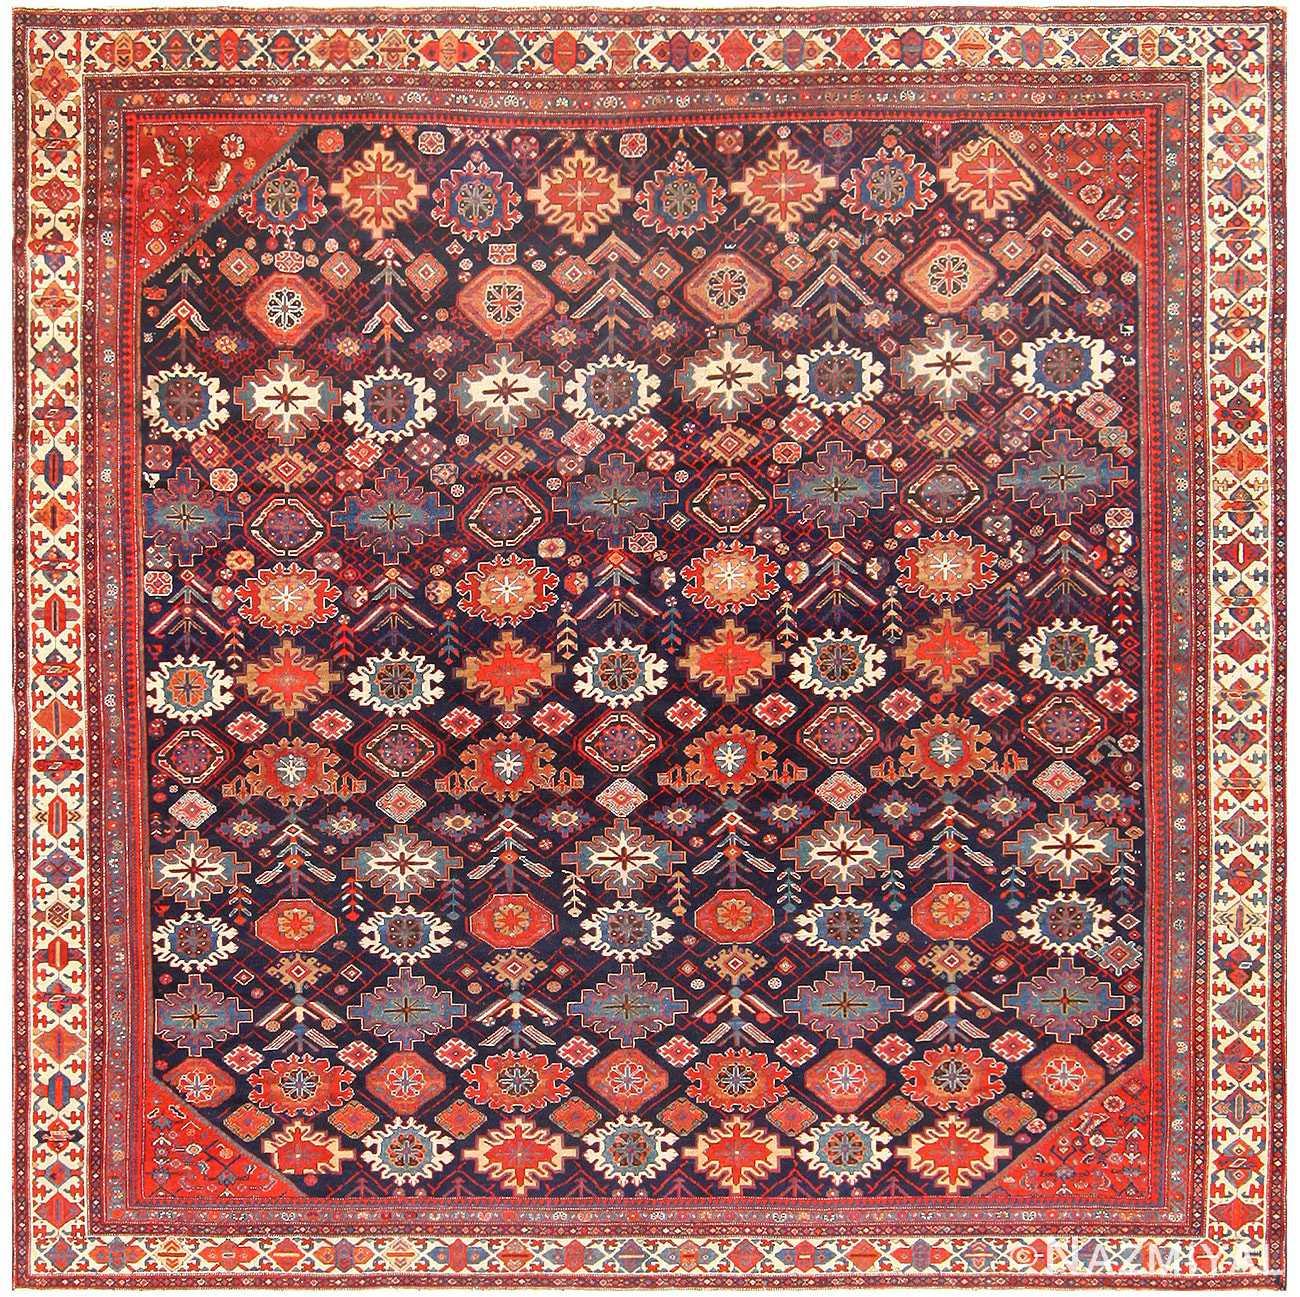 Square Antique Malayer Persian Carpet 48467 Nazmiyal